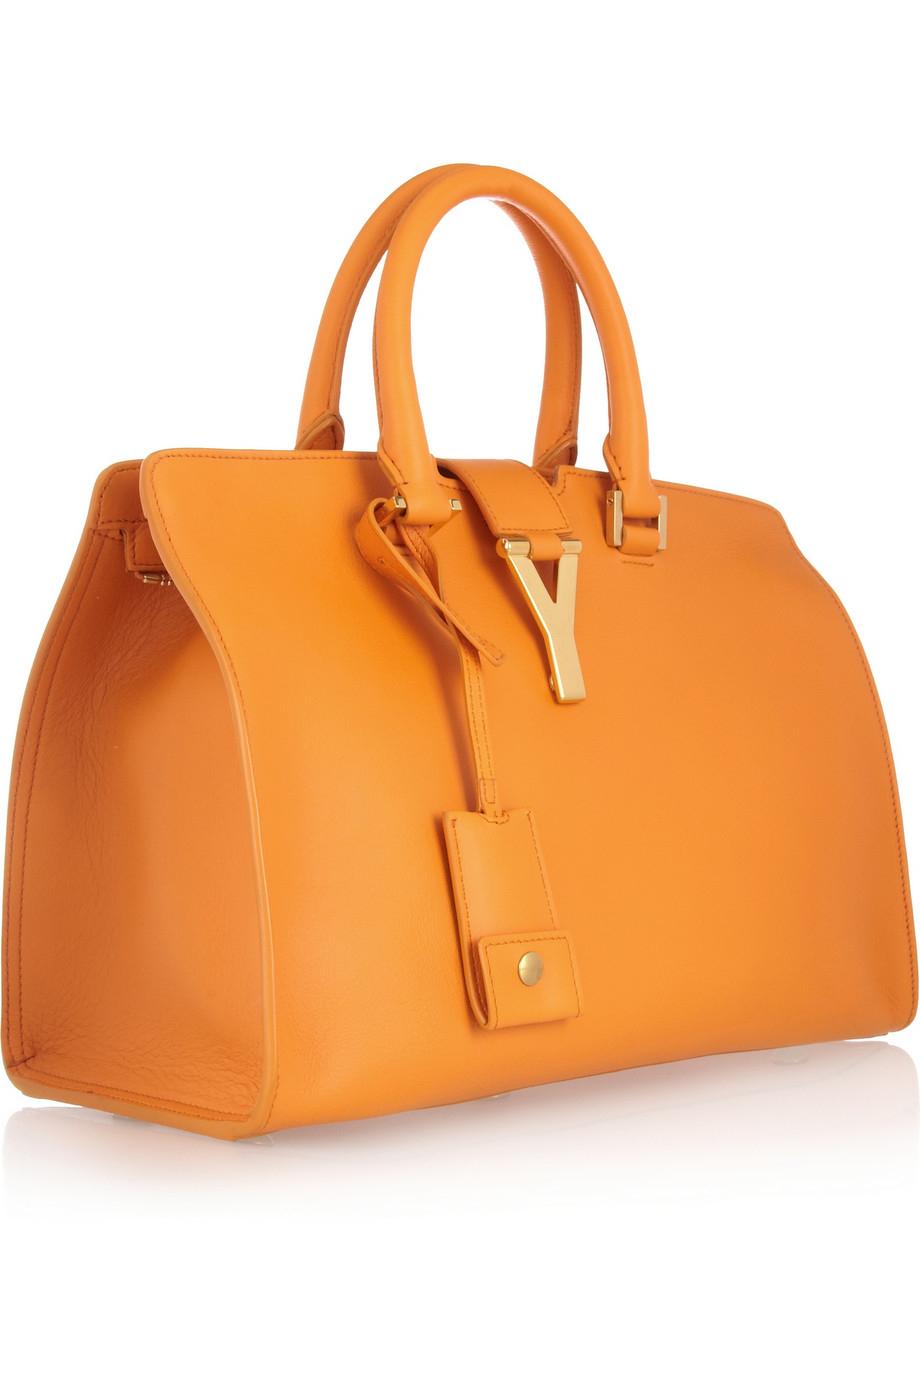 2ffad02d6bba Lyst - Saint Laurent Ligne Classique Y Leather Tote in Orange